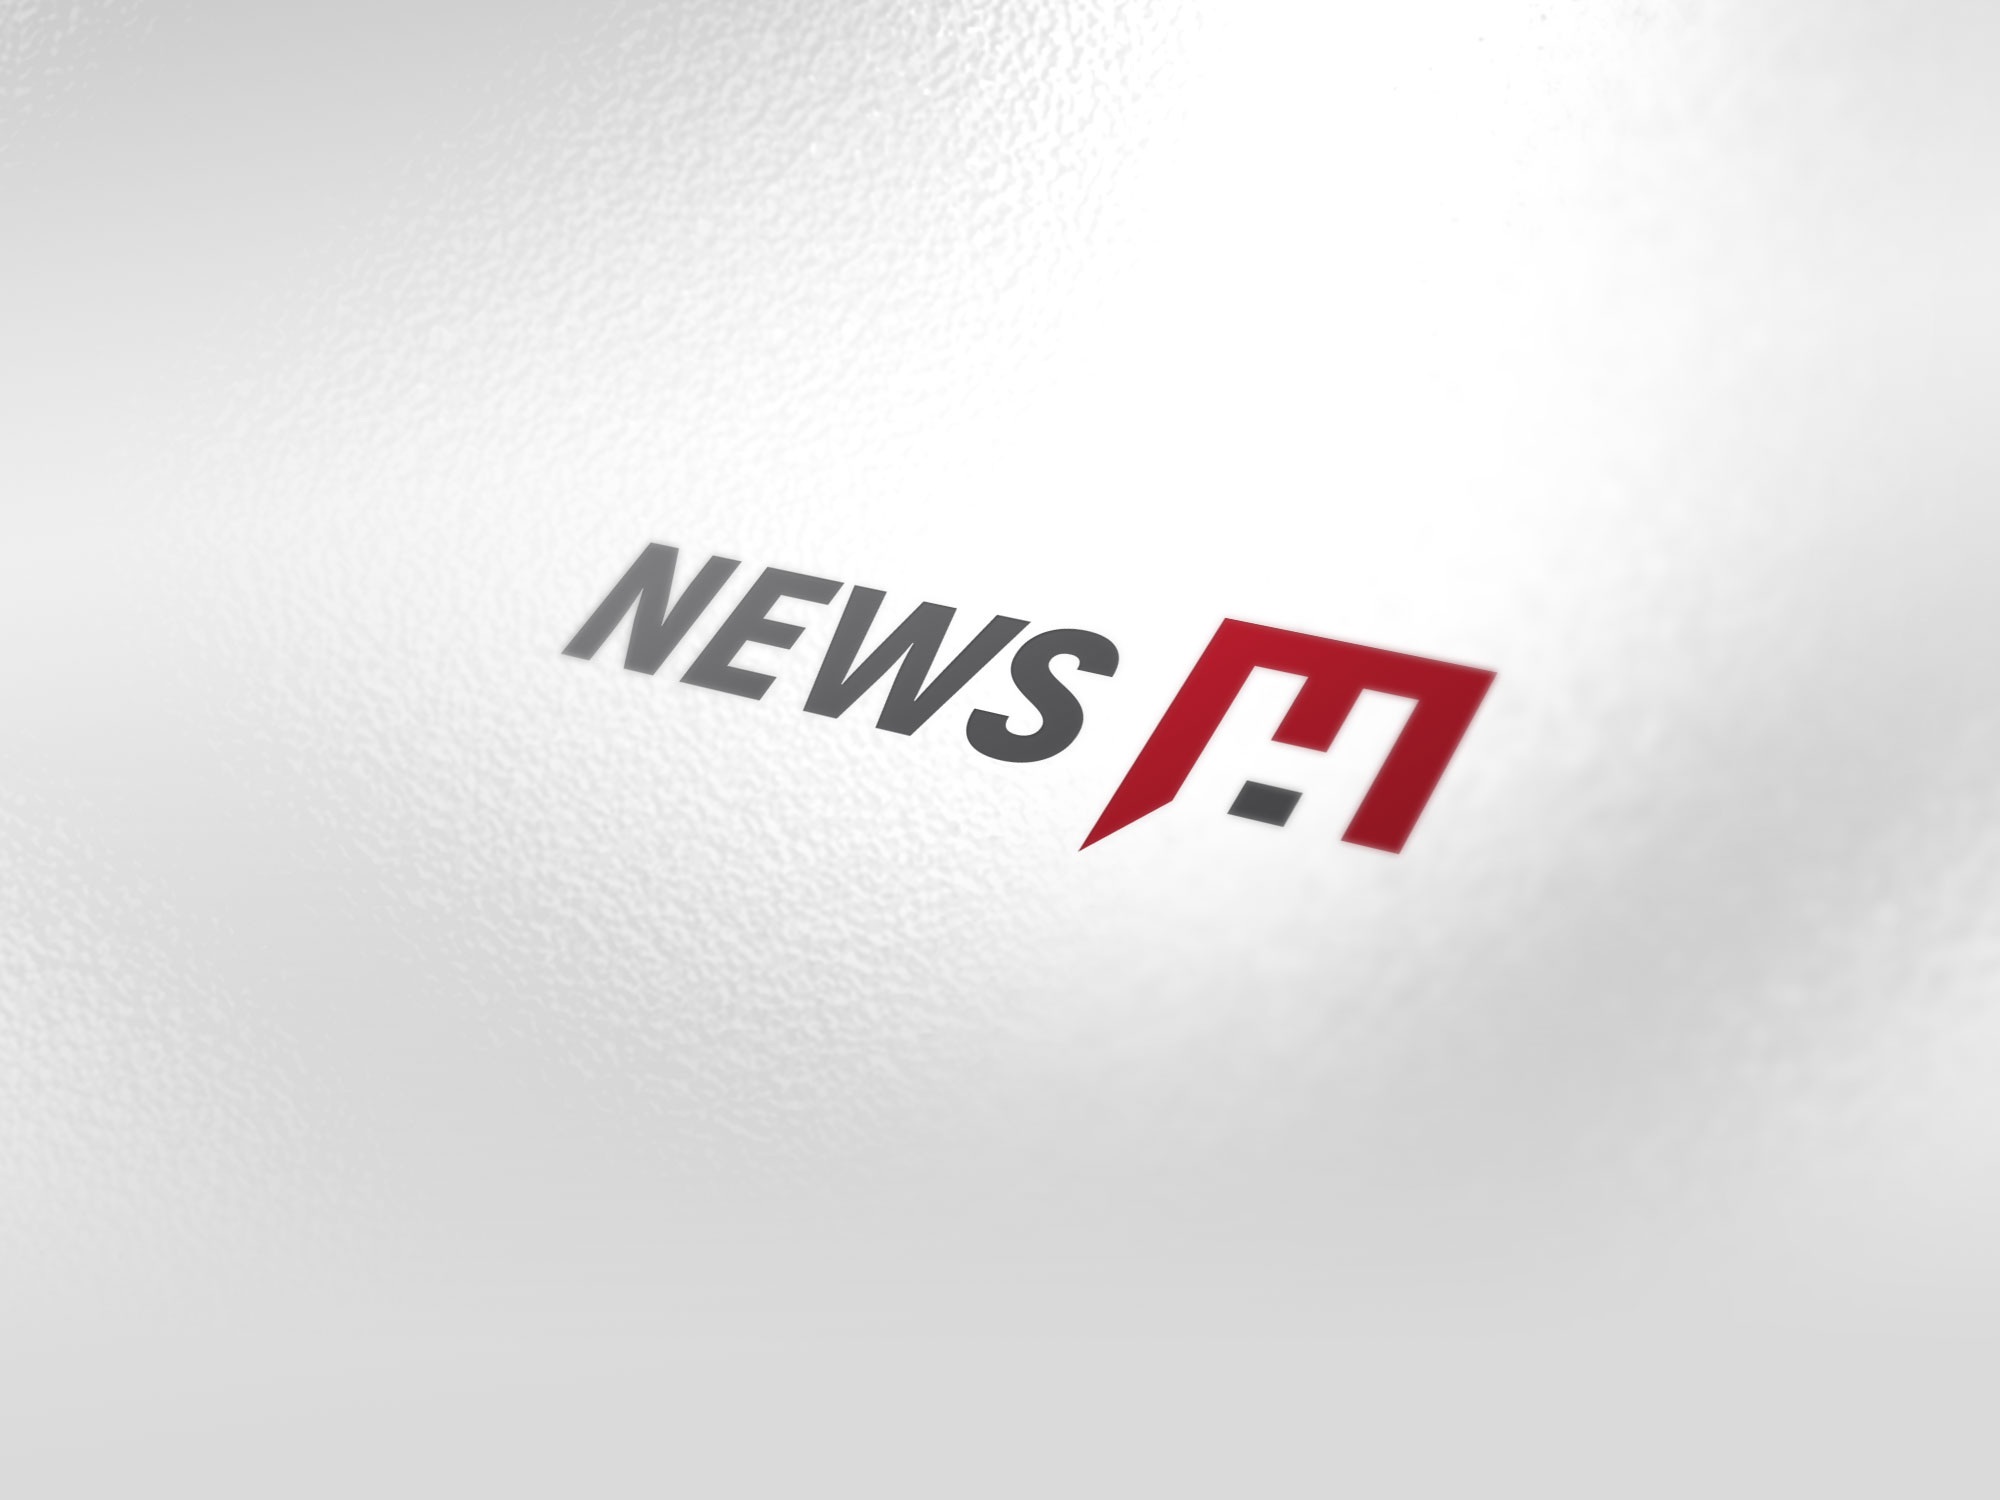 Логотип для информационного агентства фото f_3995aa687ea6ef23.jpg